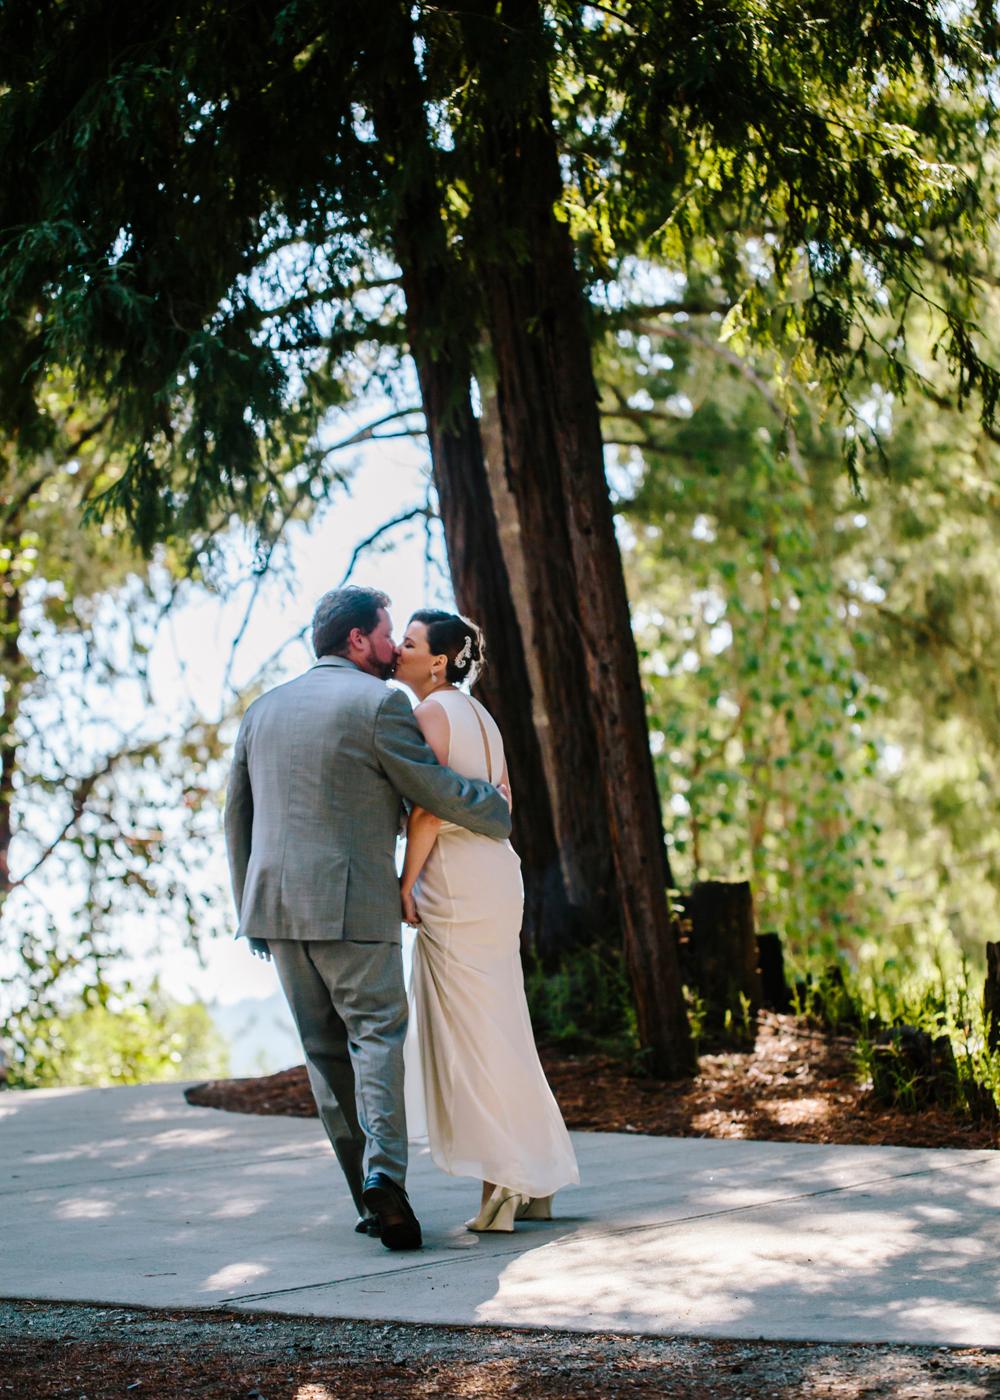 pema-osel-ling-santa-cruz-wedding-photography-lilouette-50.jpg